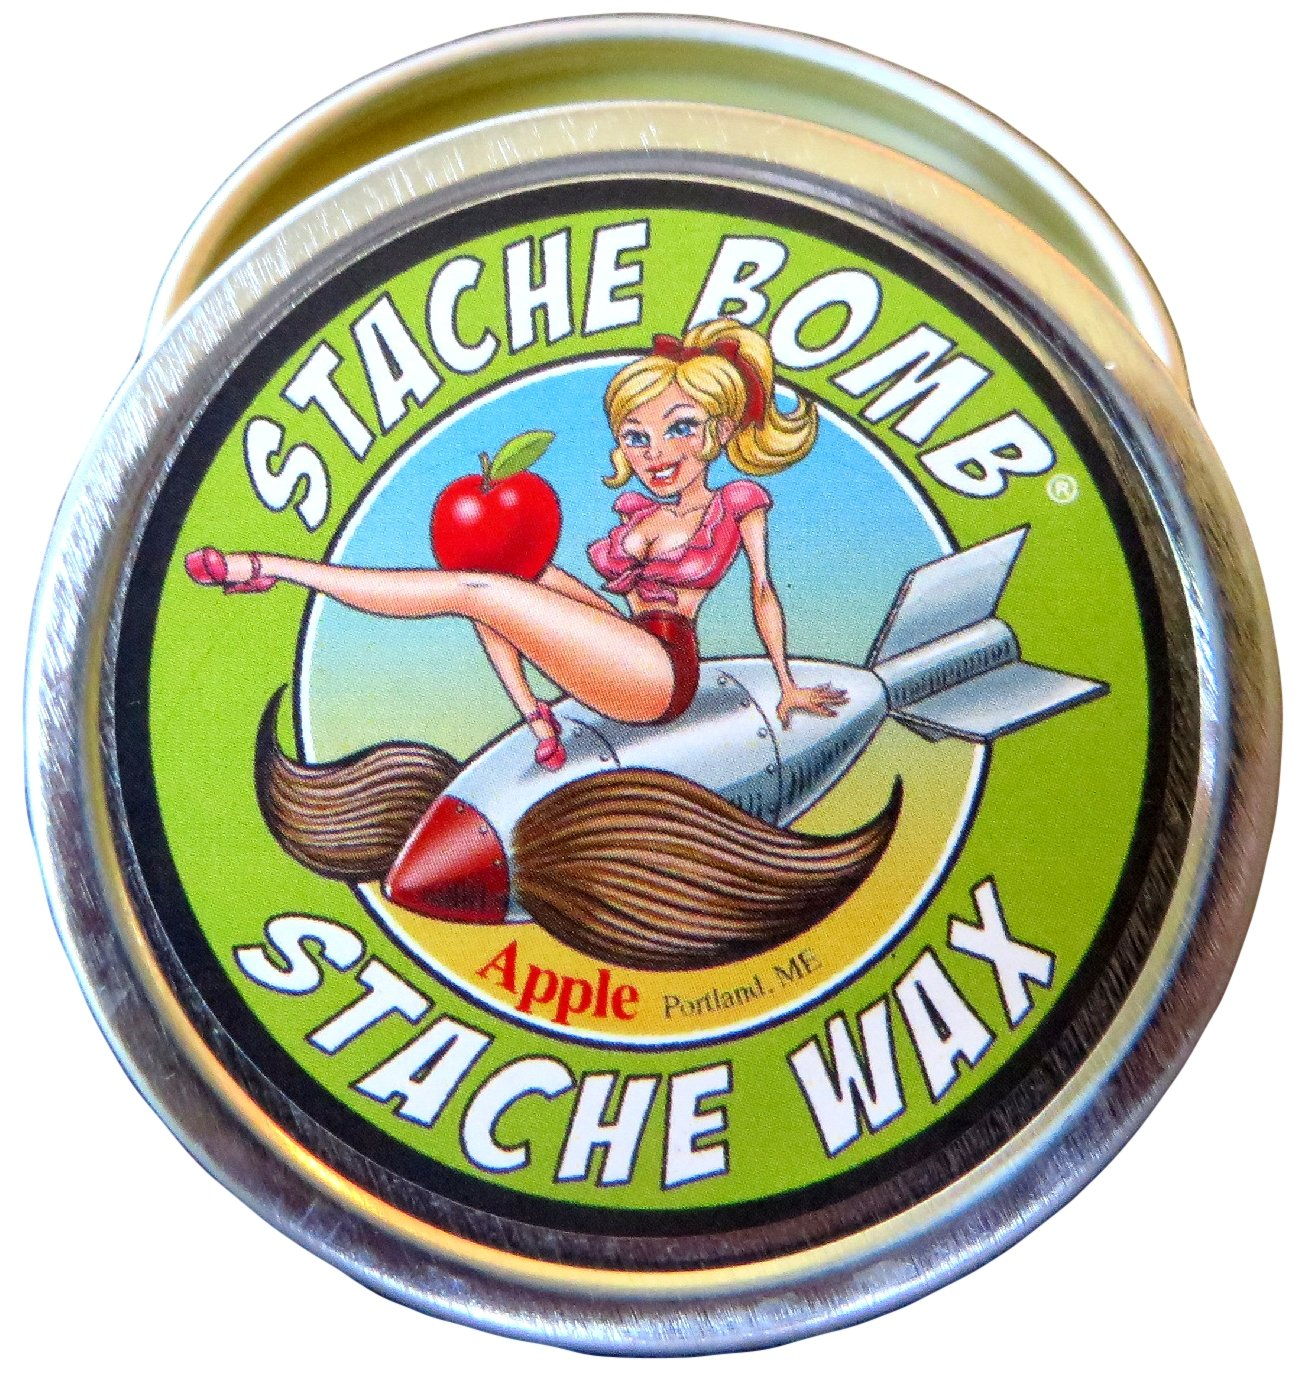 Apple Stache Bomb Stache Wax- Moustache Wax From Maine